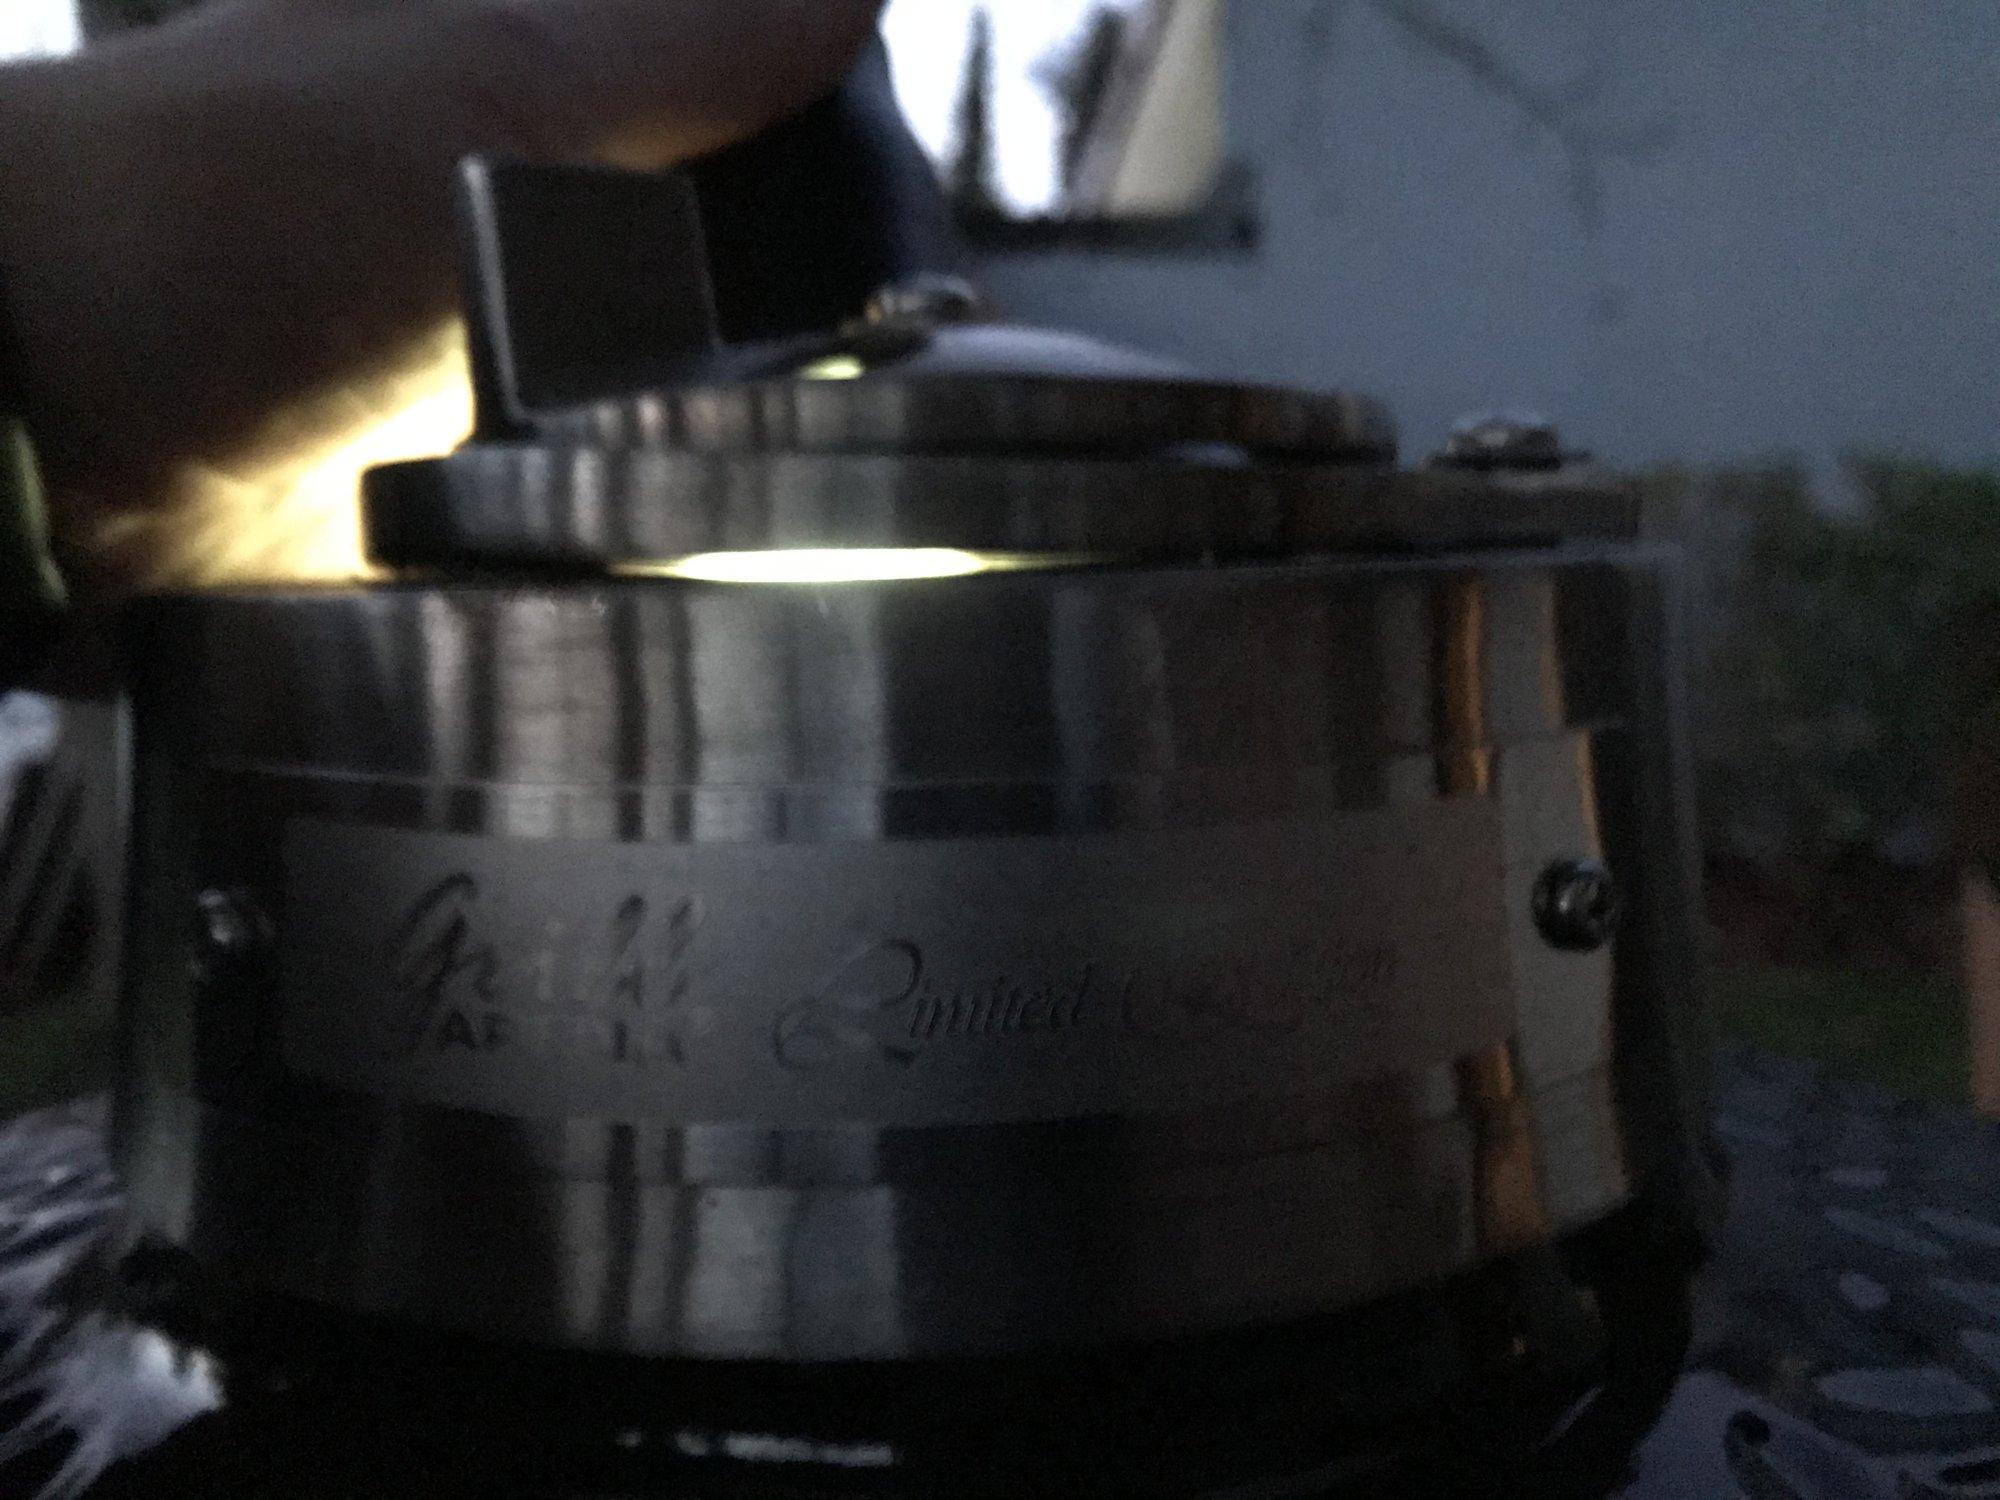 BF1B41EE-64C2-4C20-862B-564F0D5A25D1.jpeg